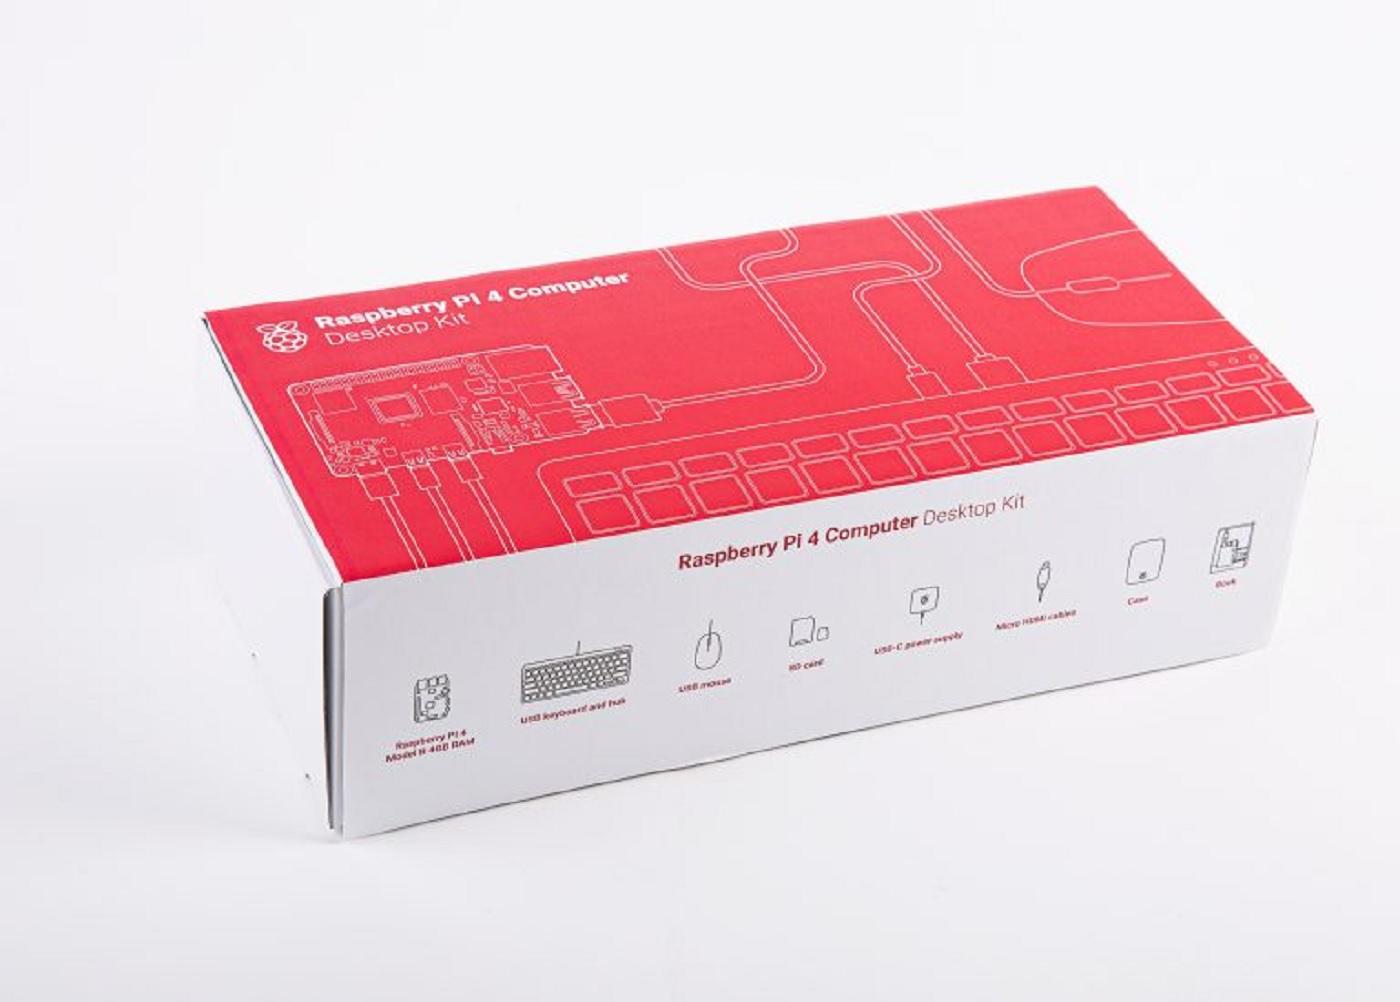 Le desktop Kit de raspberry Pi